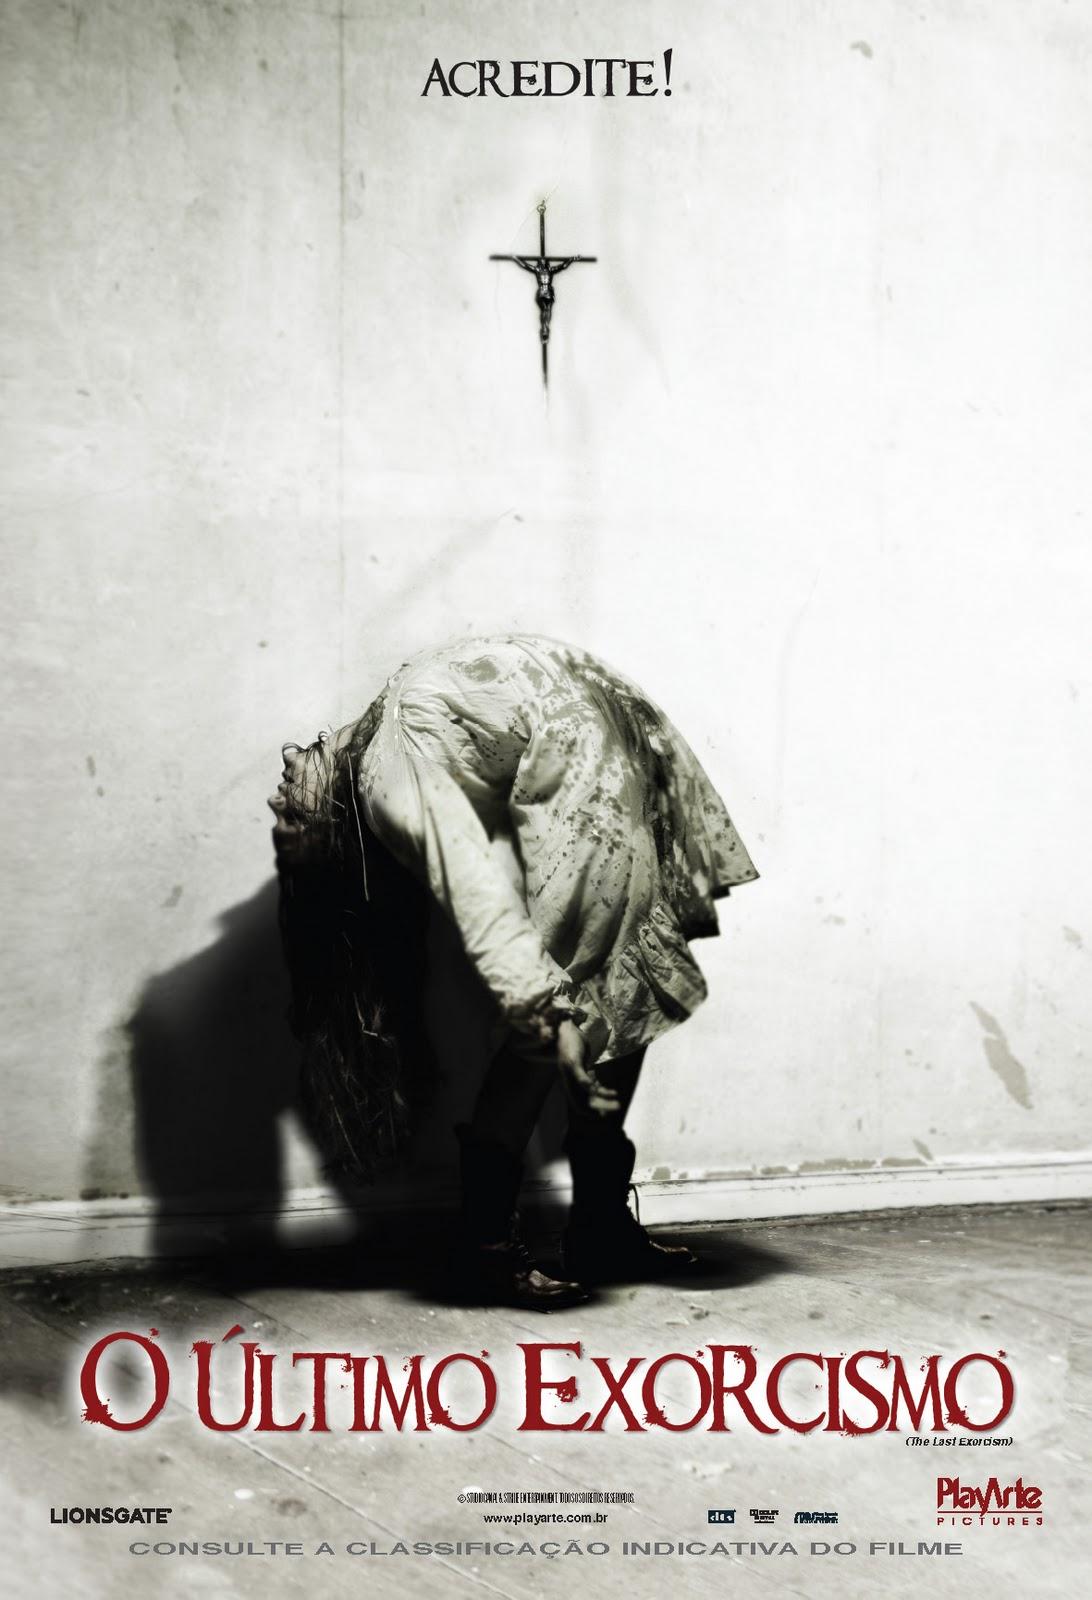 http://2.bp.blogspot.com/-JCQJ6csct6w/Tnd55AeyUYI/AAAAAAAAApY/yL7dyLHjd2Y/s1600/poster-last-exorcism-alta.jpg